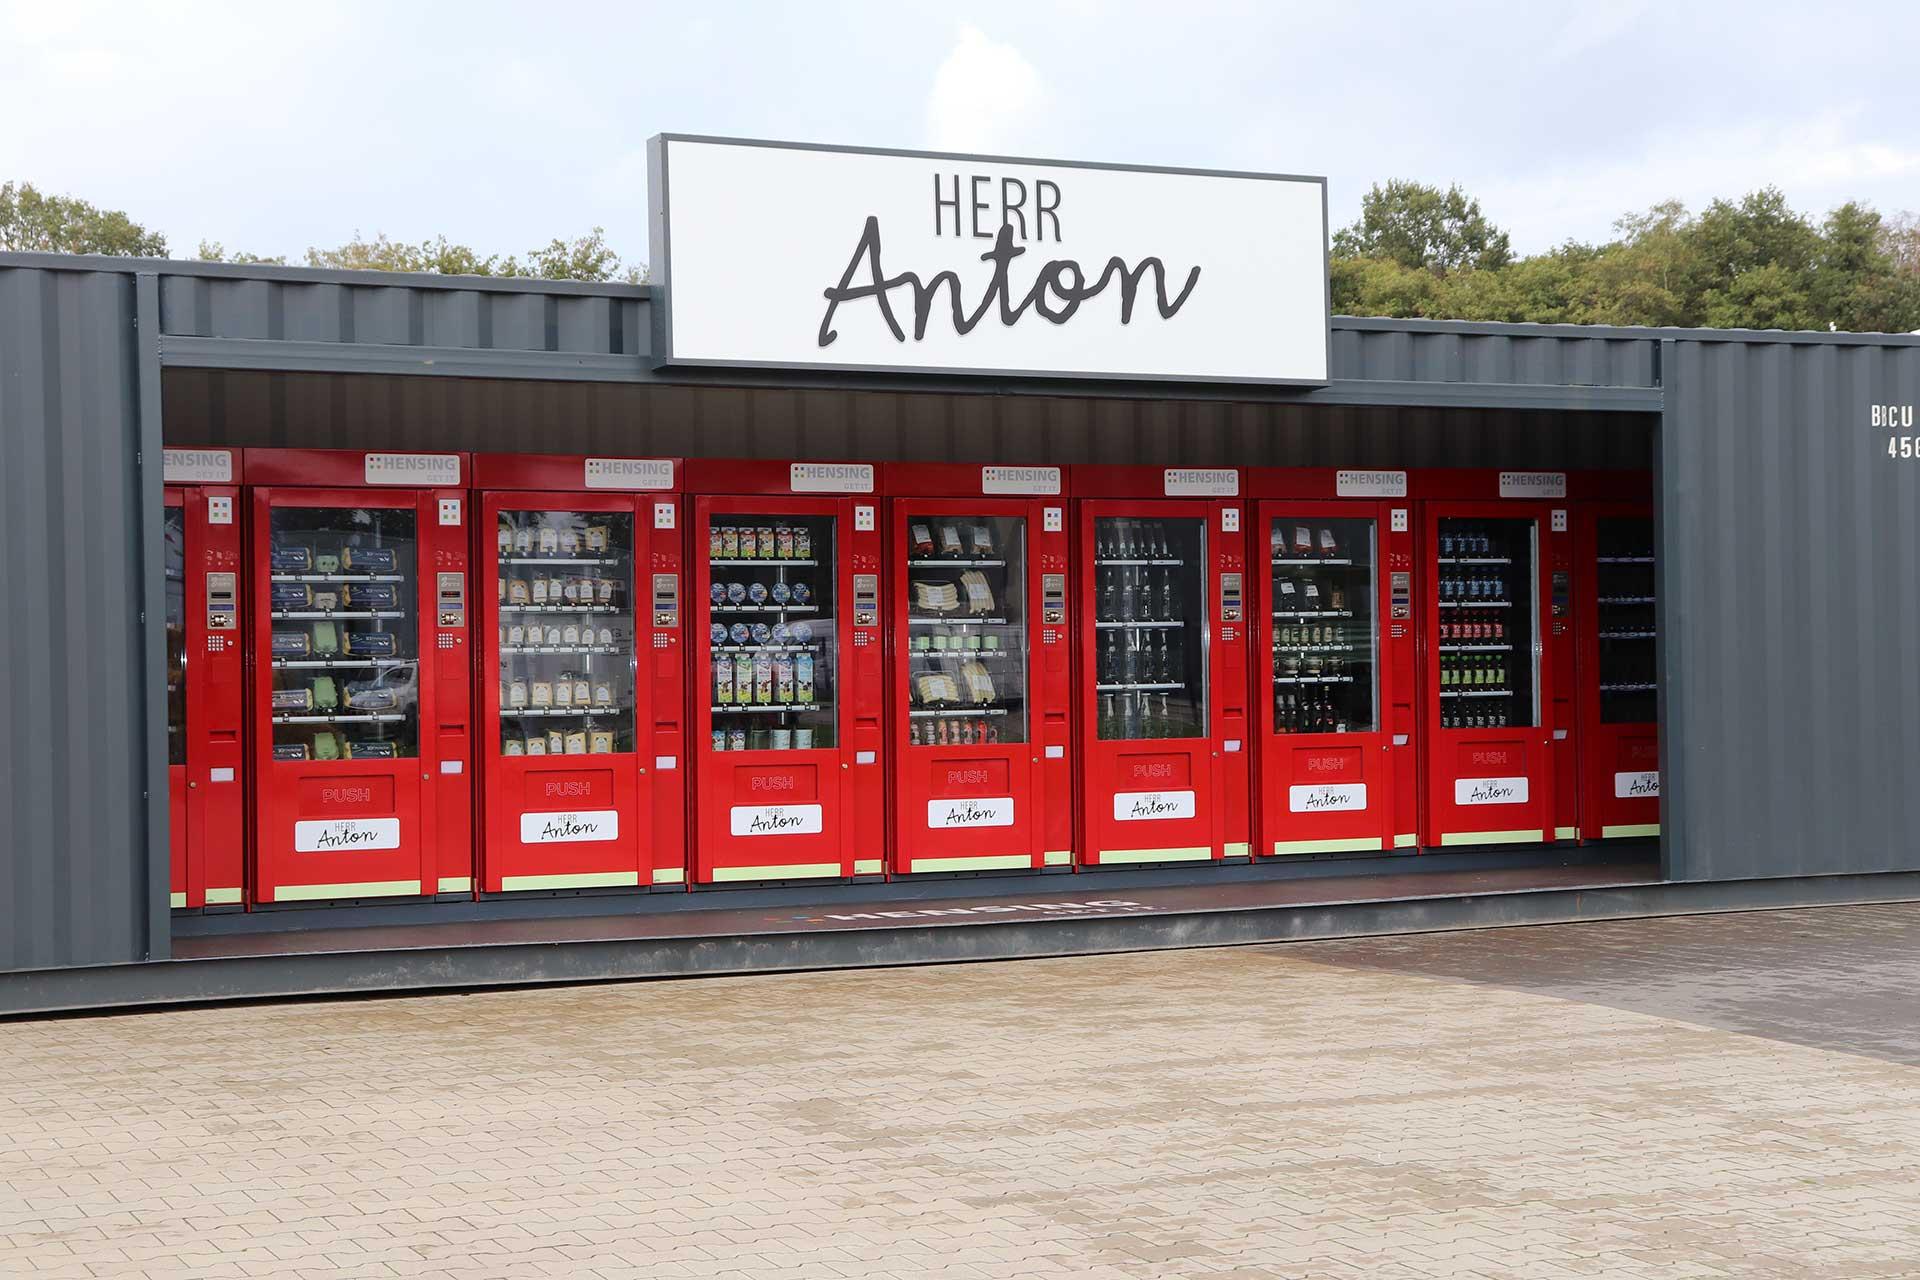 Herr Anton 40 Fuss Container